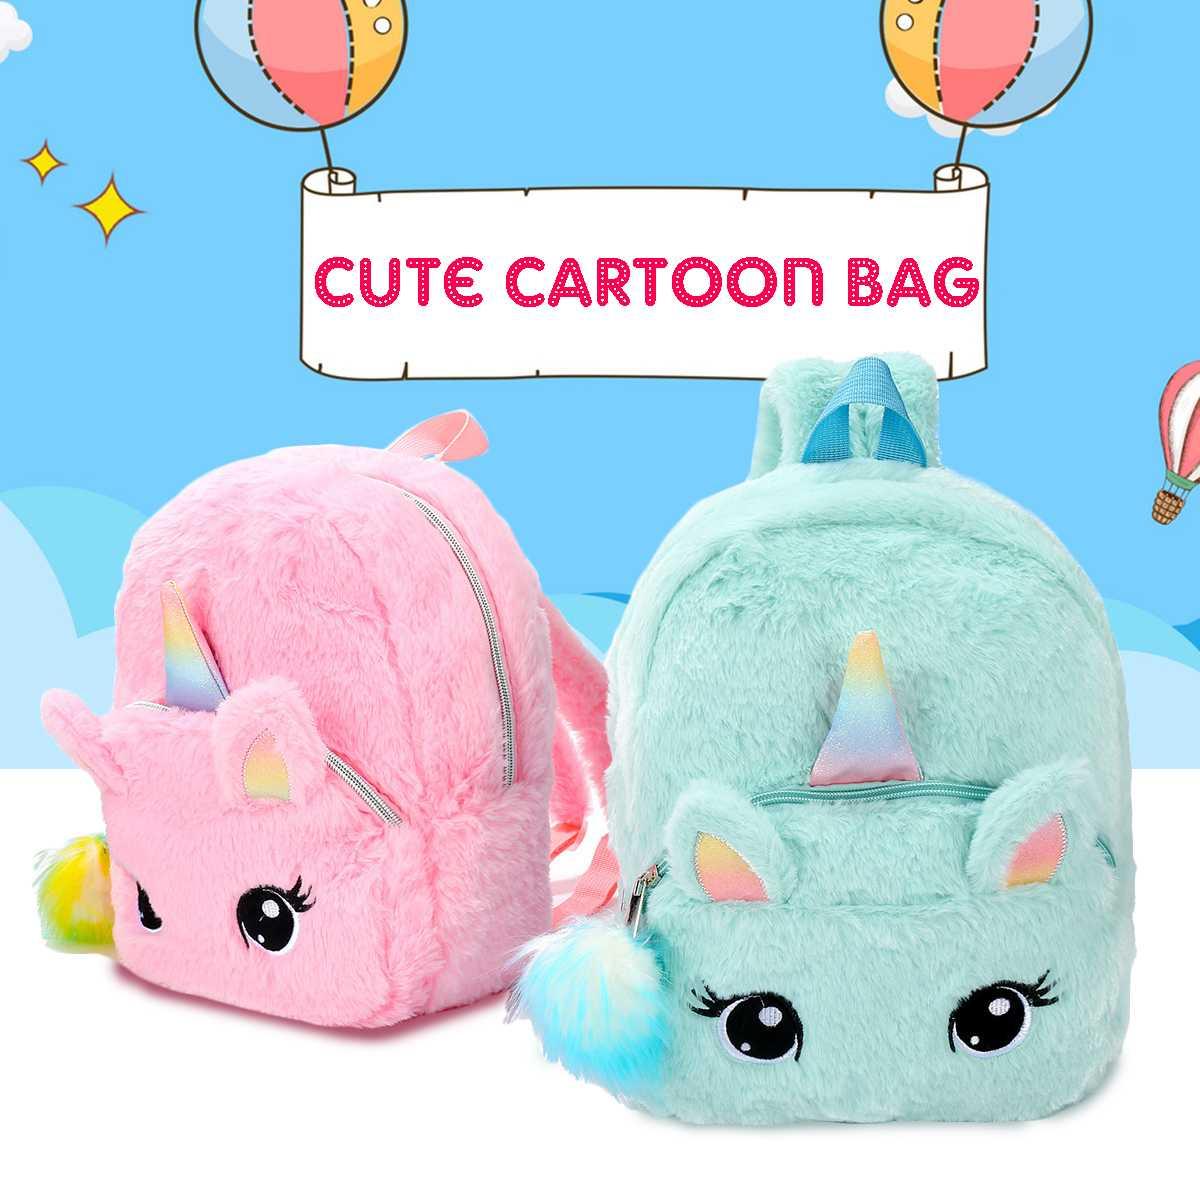 New Plush Unicorns Cartoon Backpacks Cute Fashion Fur Backpacks For Girls Travel Backpack Children Schoolbag Kids Gift Book Bag